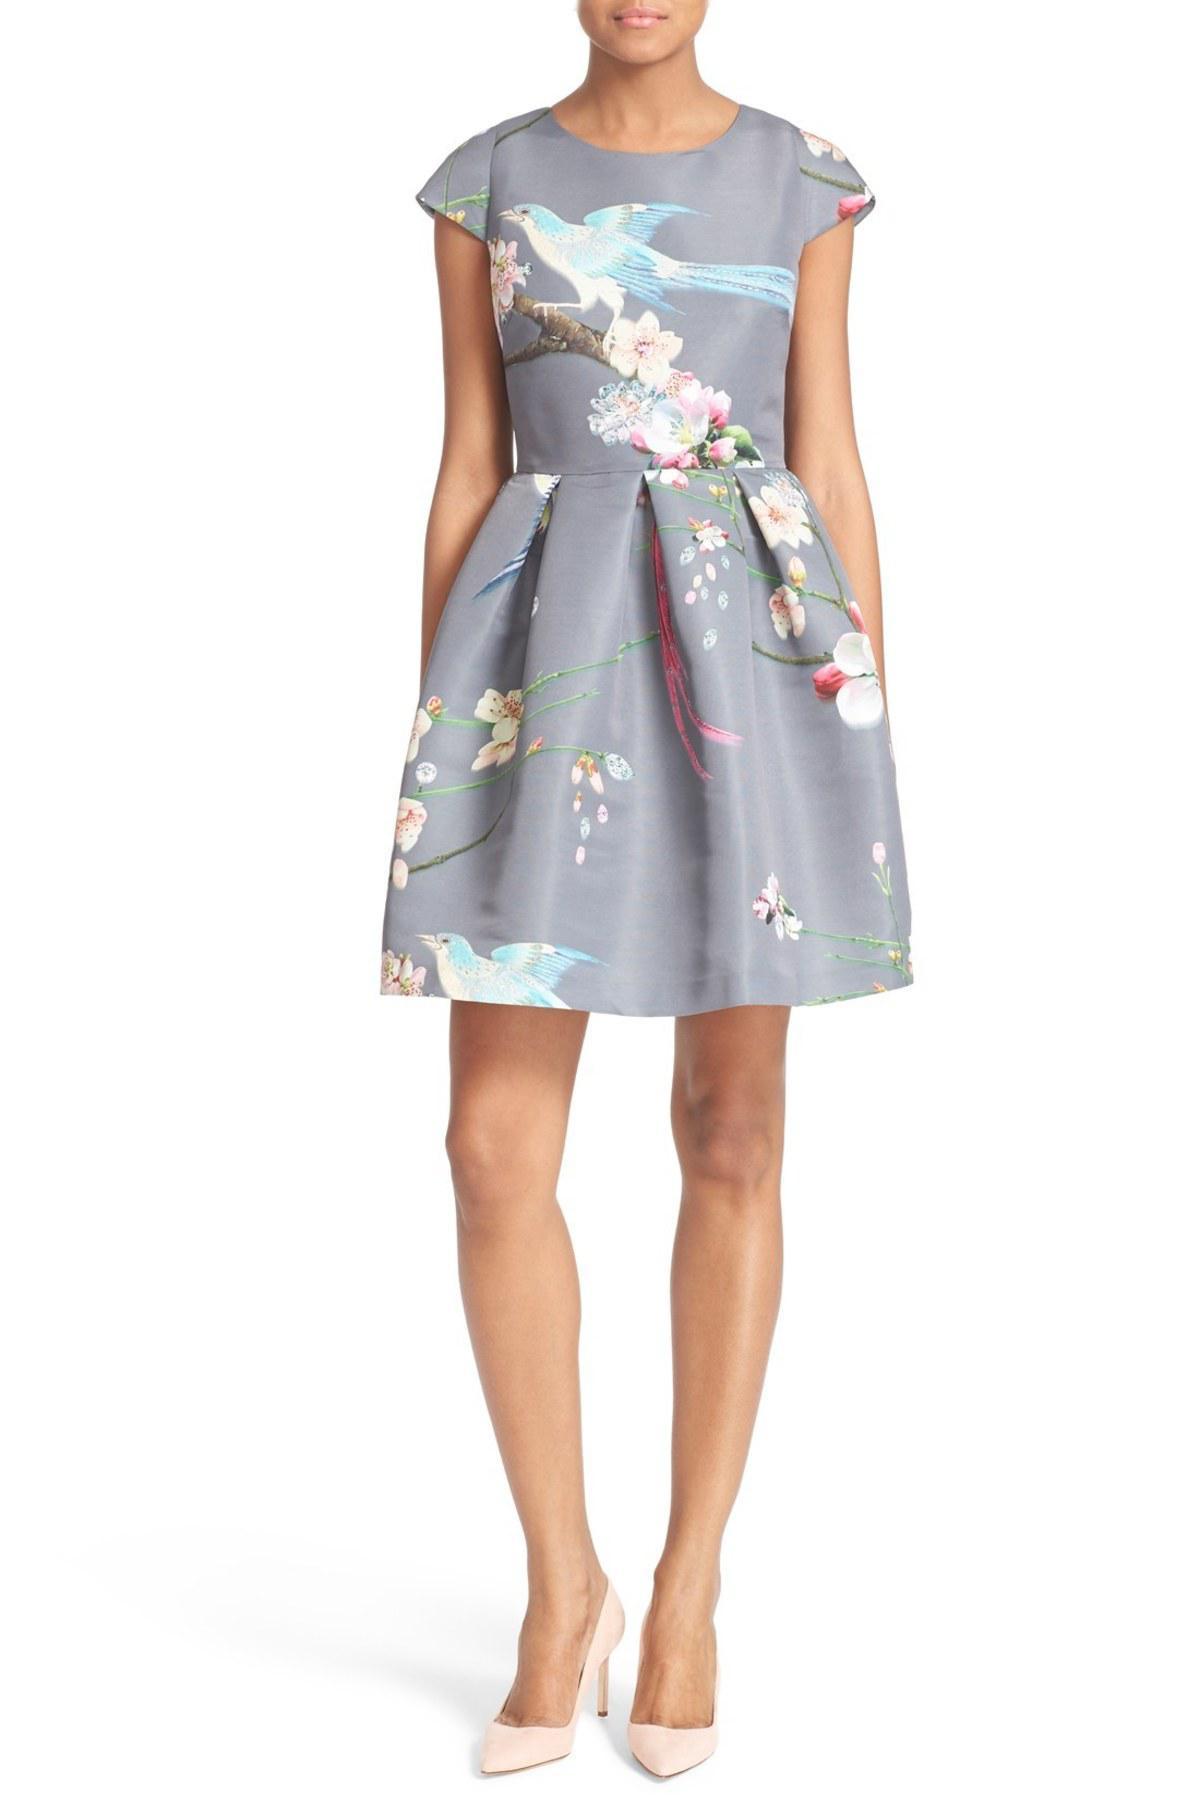 dd3b728c7314c6 Lyst - Ted Baker Zaldana Print Fit   Flare Dress in Gray